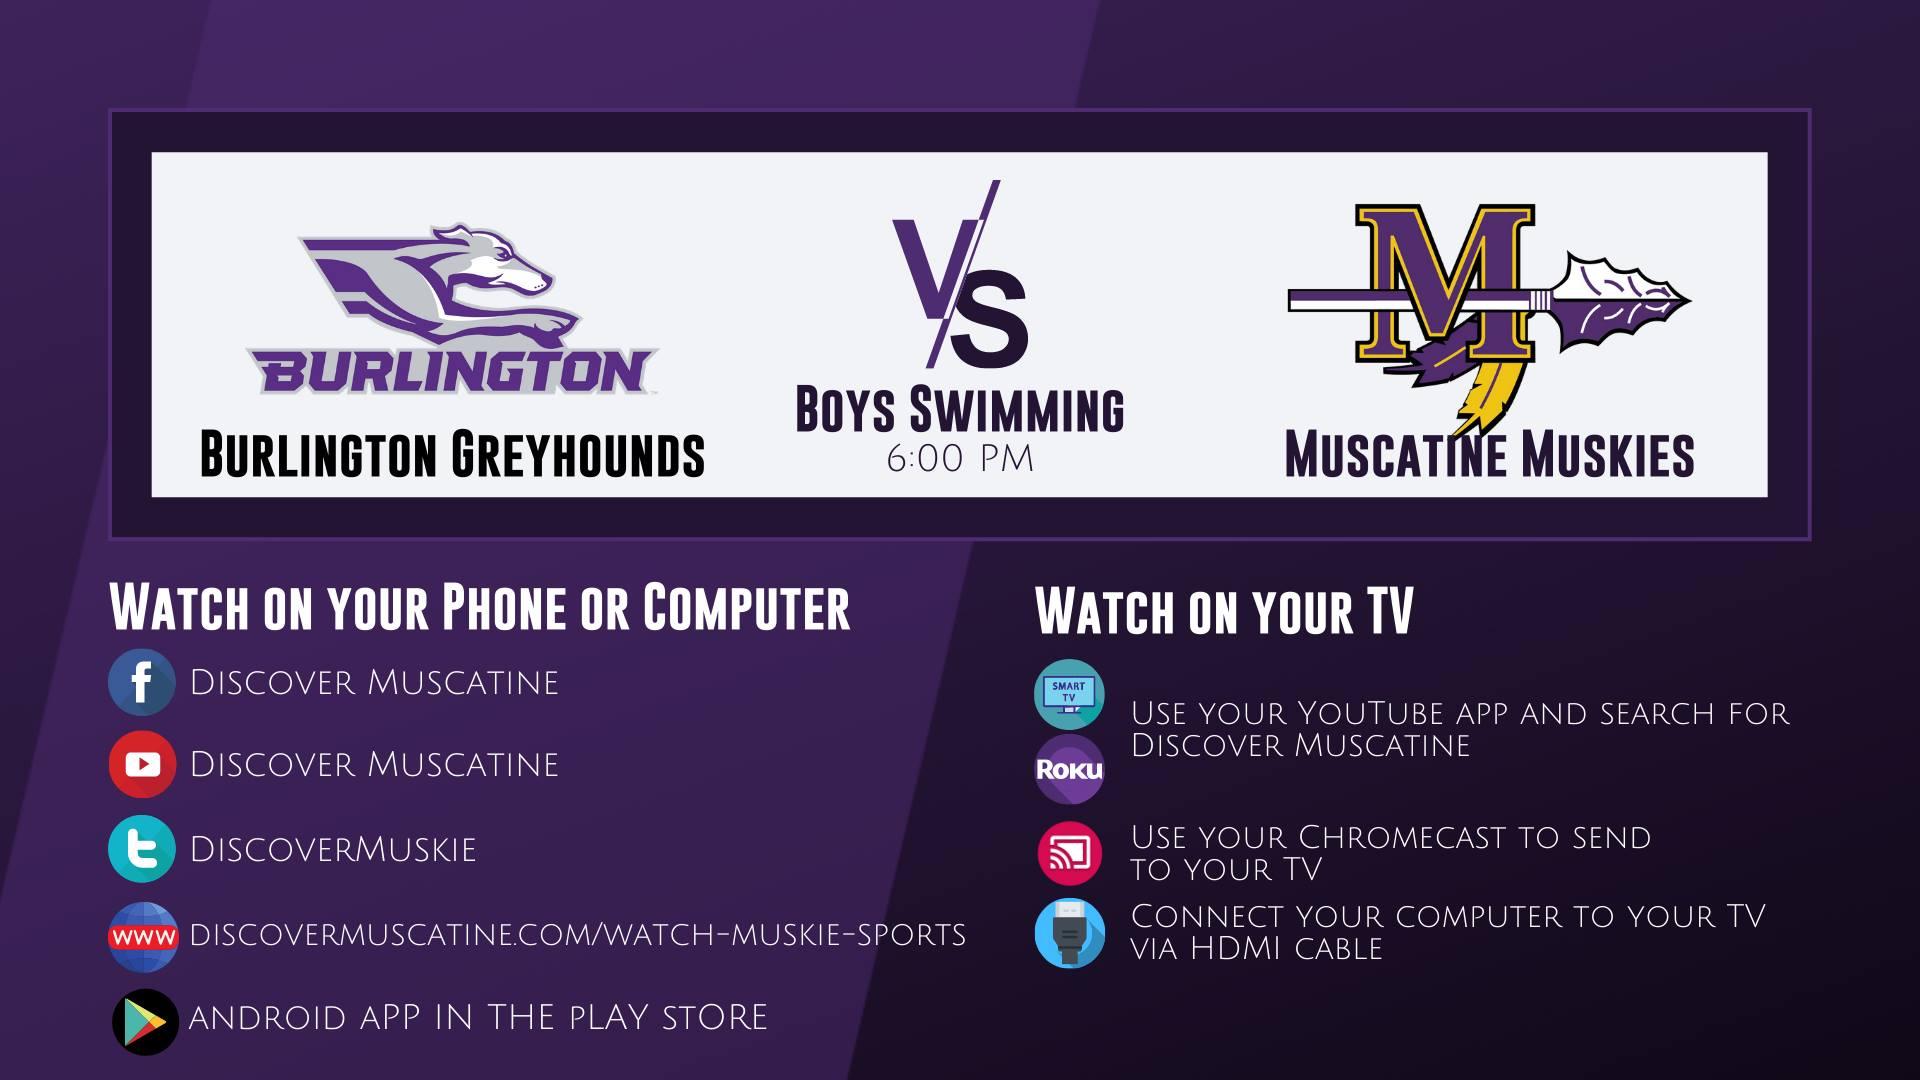 Muskie Boys Swimming vs Burlington LIVE Broadcast